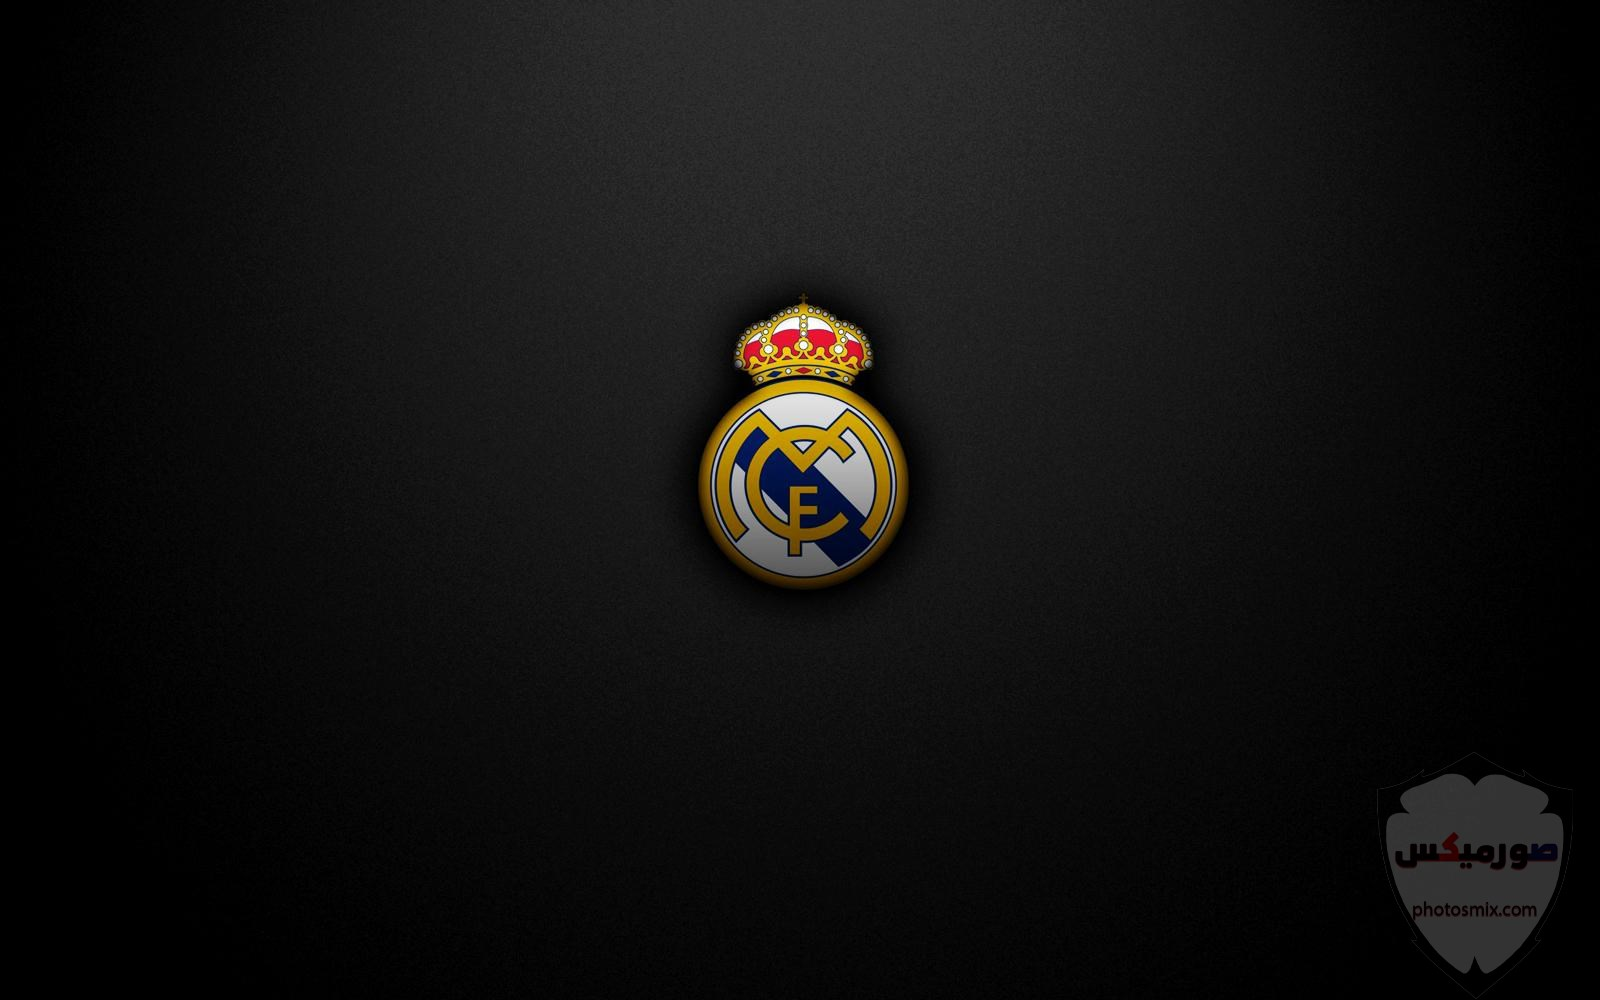 صور ريال مدريد 2020خلفيات ورمزيات ريال مدريد صور لاعبي ريال مدريد real madrid 25